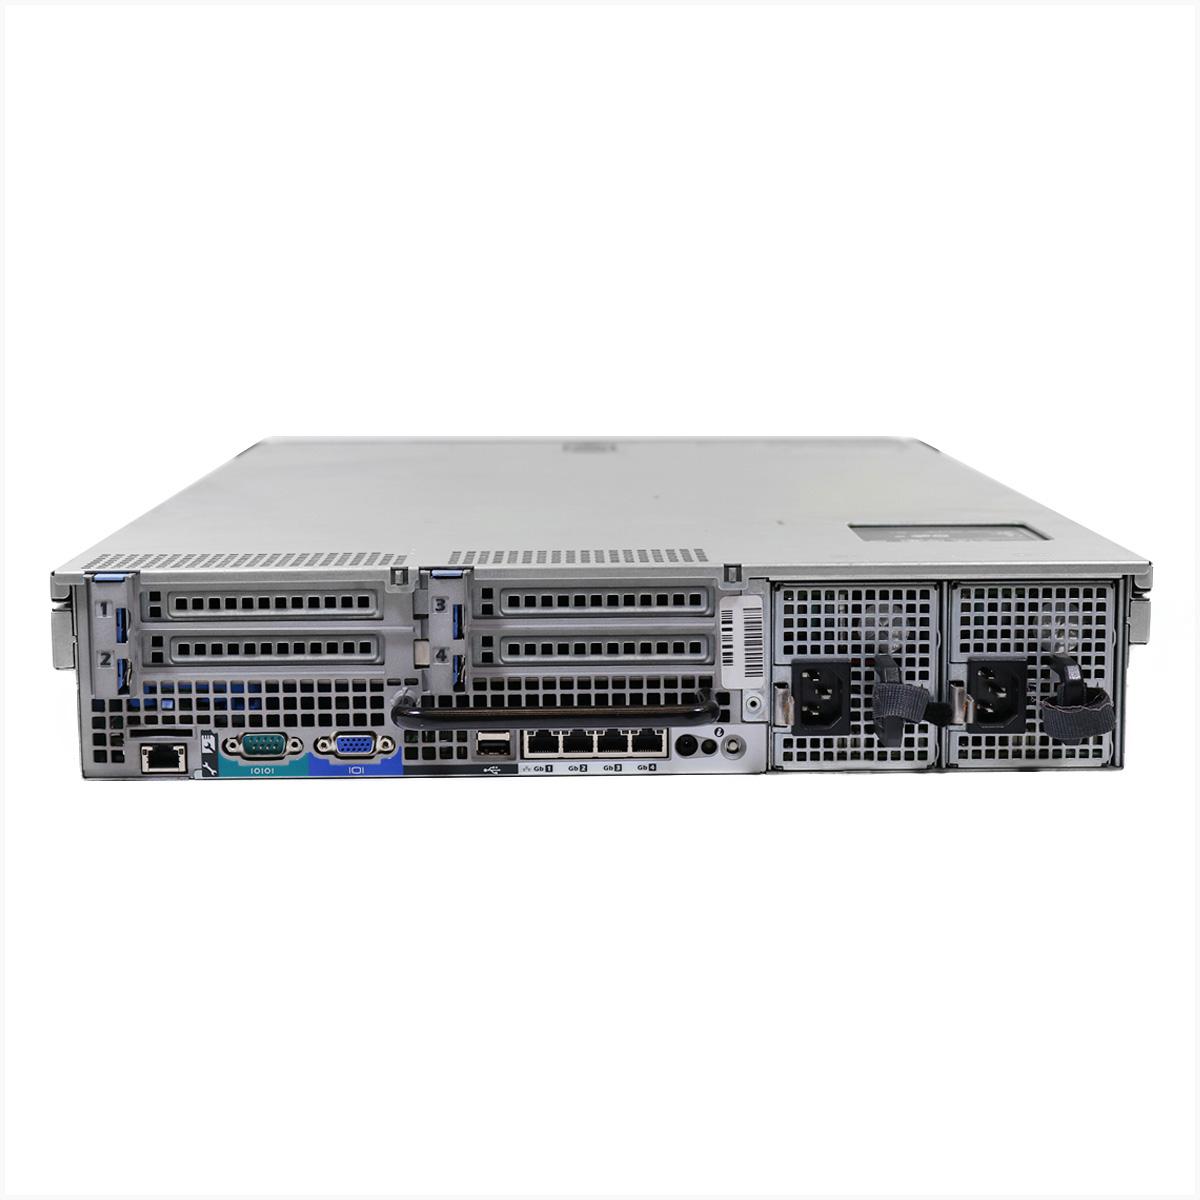 Servidor dell r710 2x xeon e5649 64gb 2x 1tb sas - usado